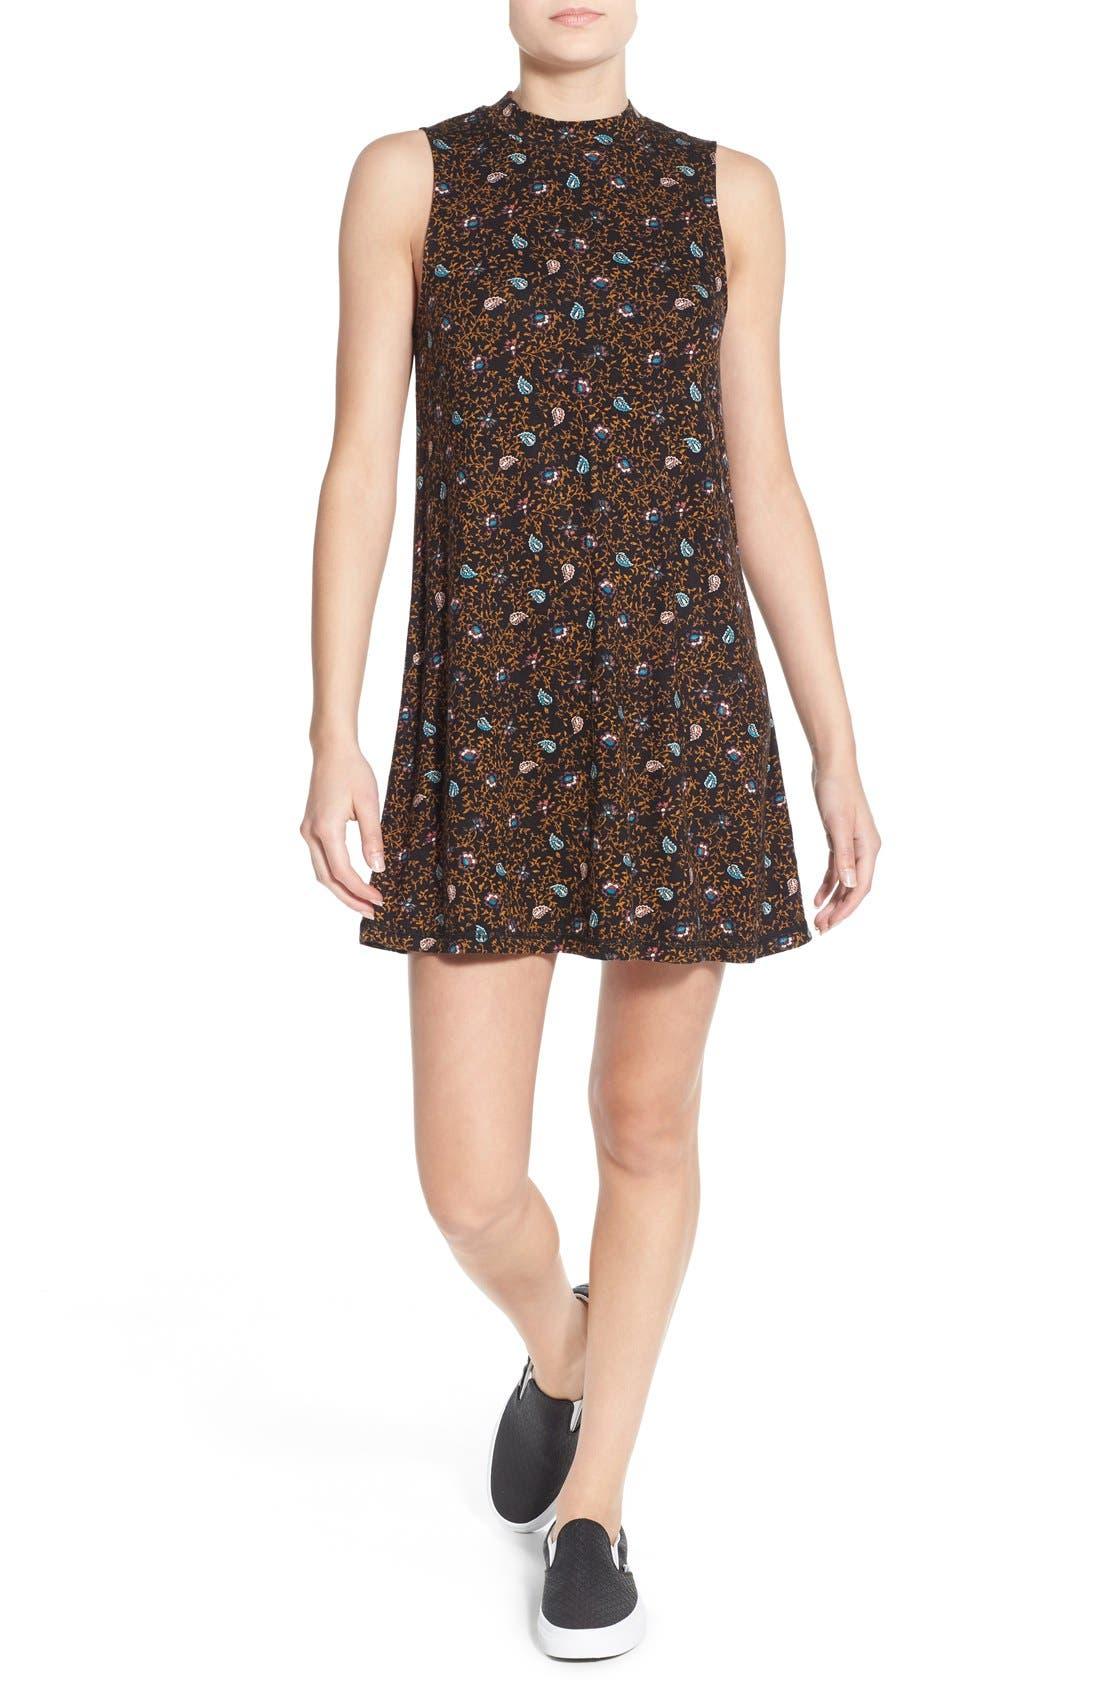 O'NEILL 'Lucy' Print Mock Neck Knit Shift Dress, Main, color, 001